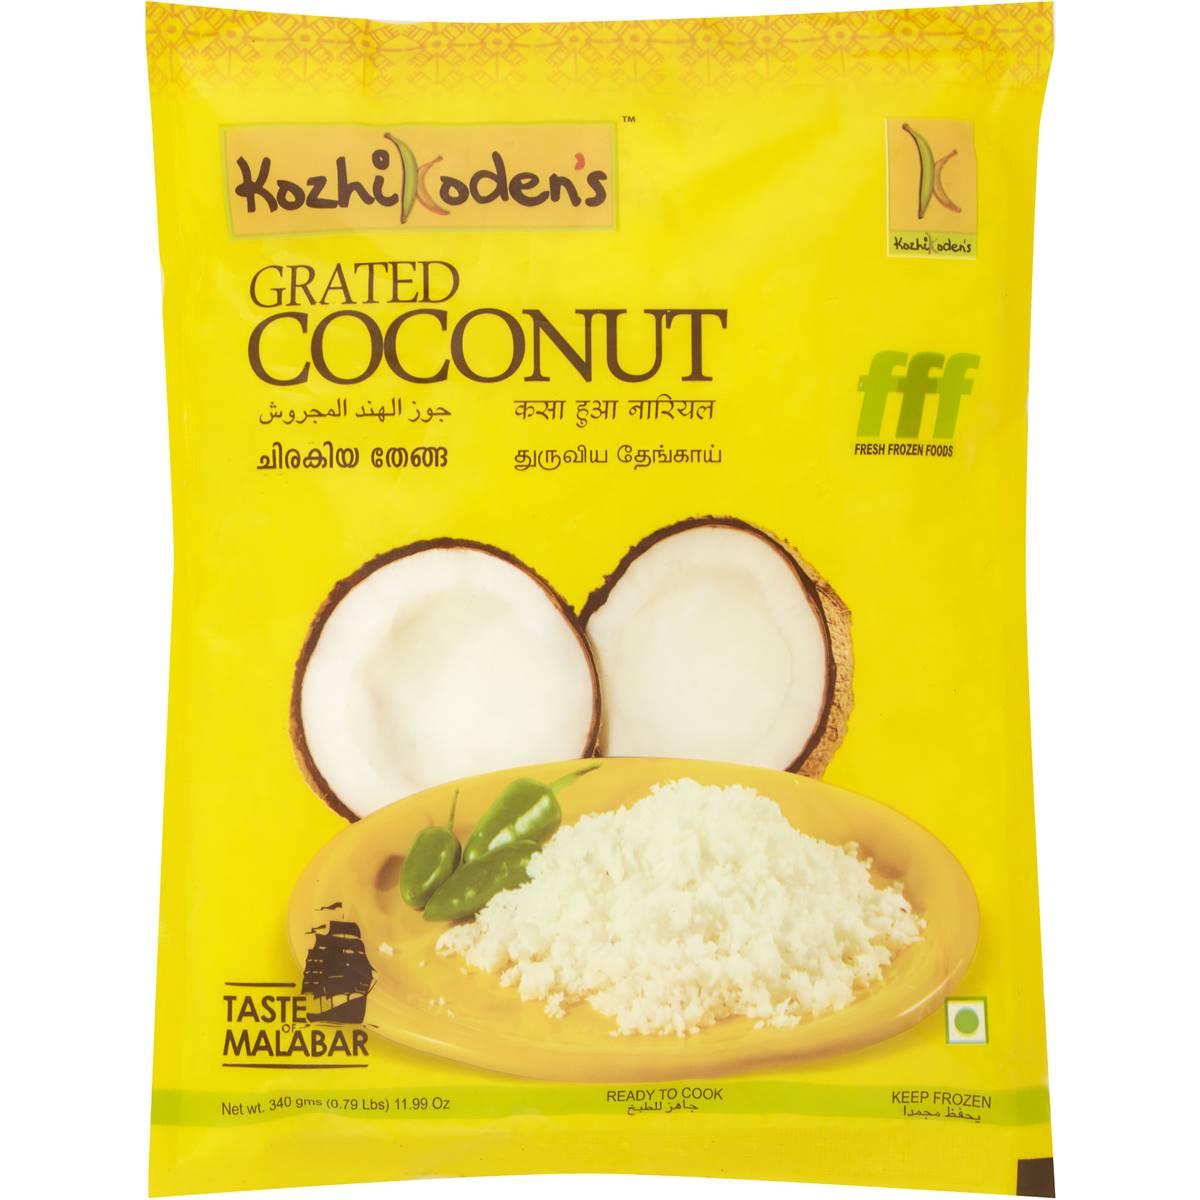 Buy Koshikodens Grated Coconut 340gm Online